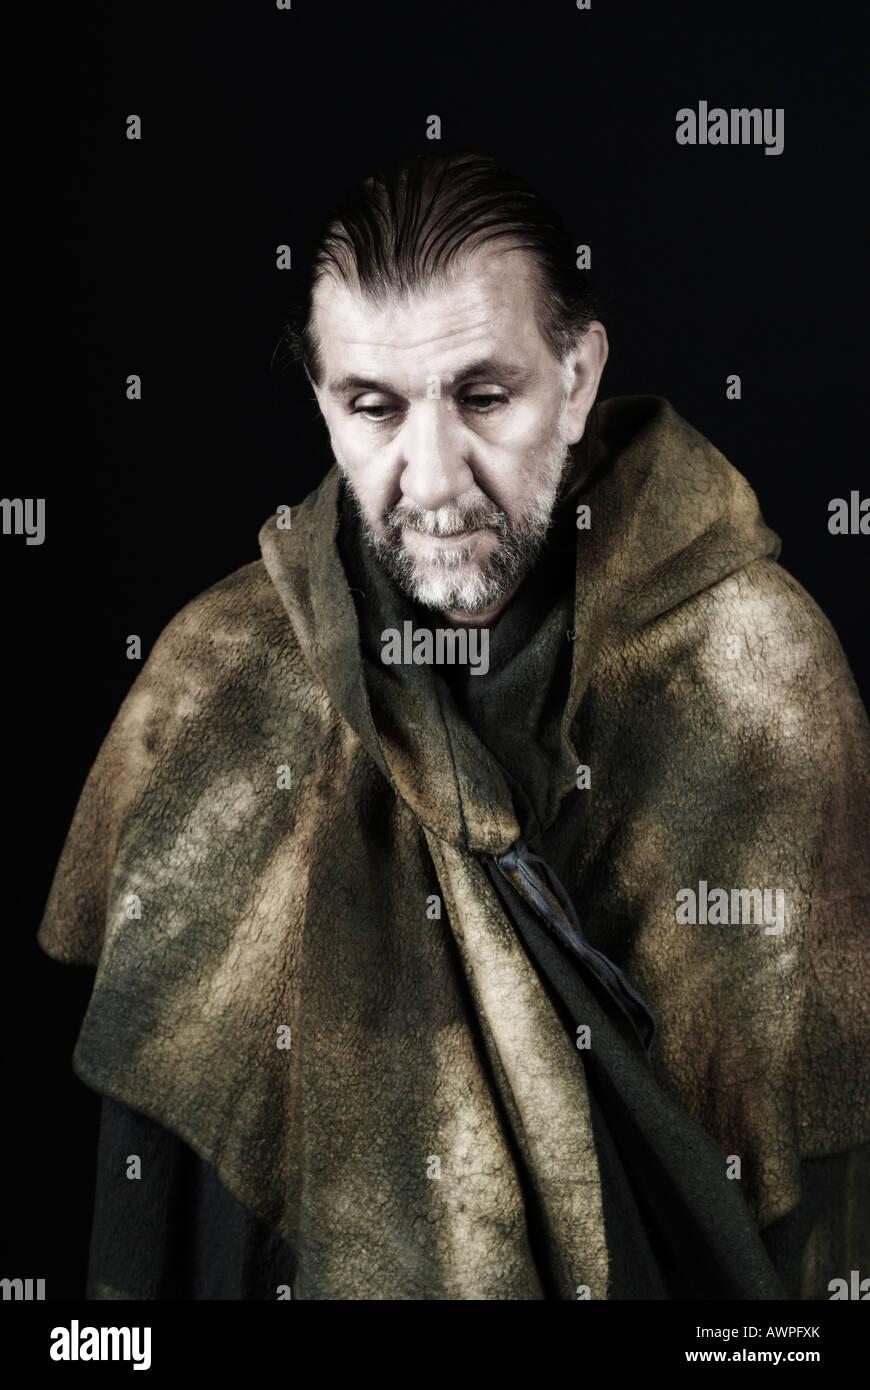 Monk wearing cloak Stock Photo